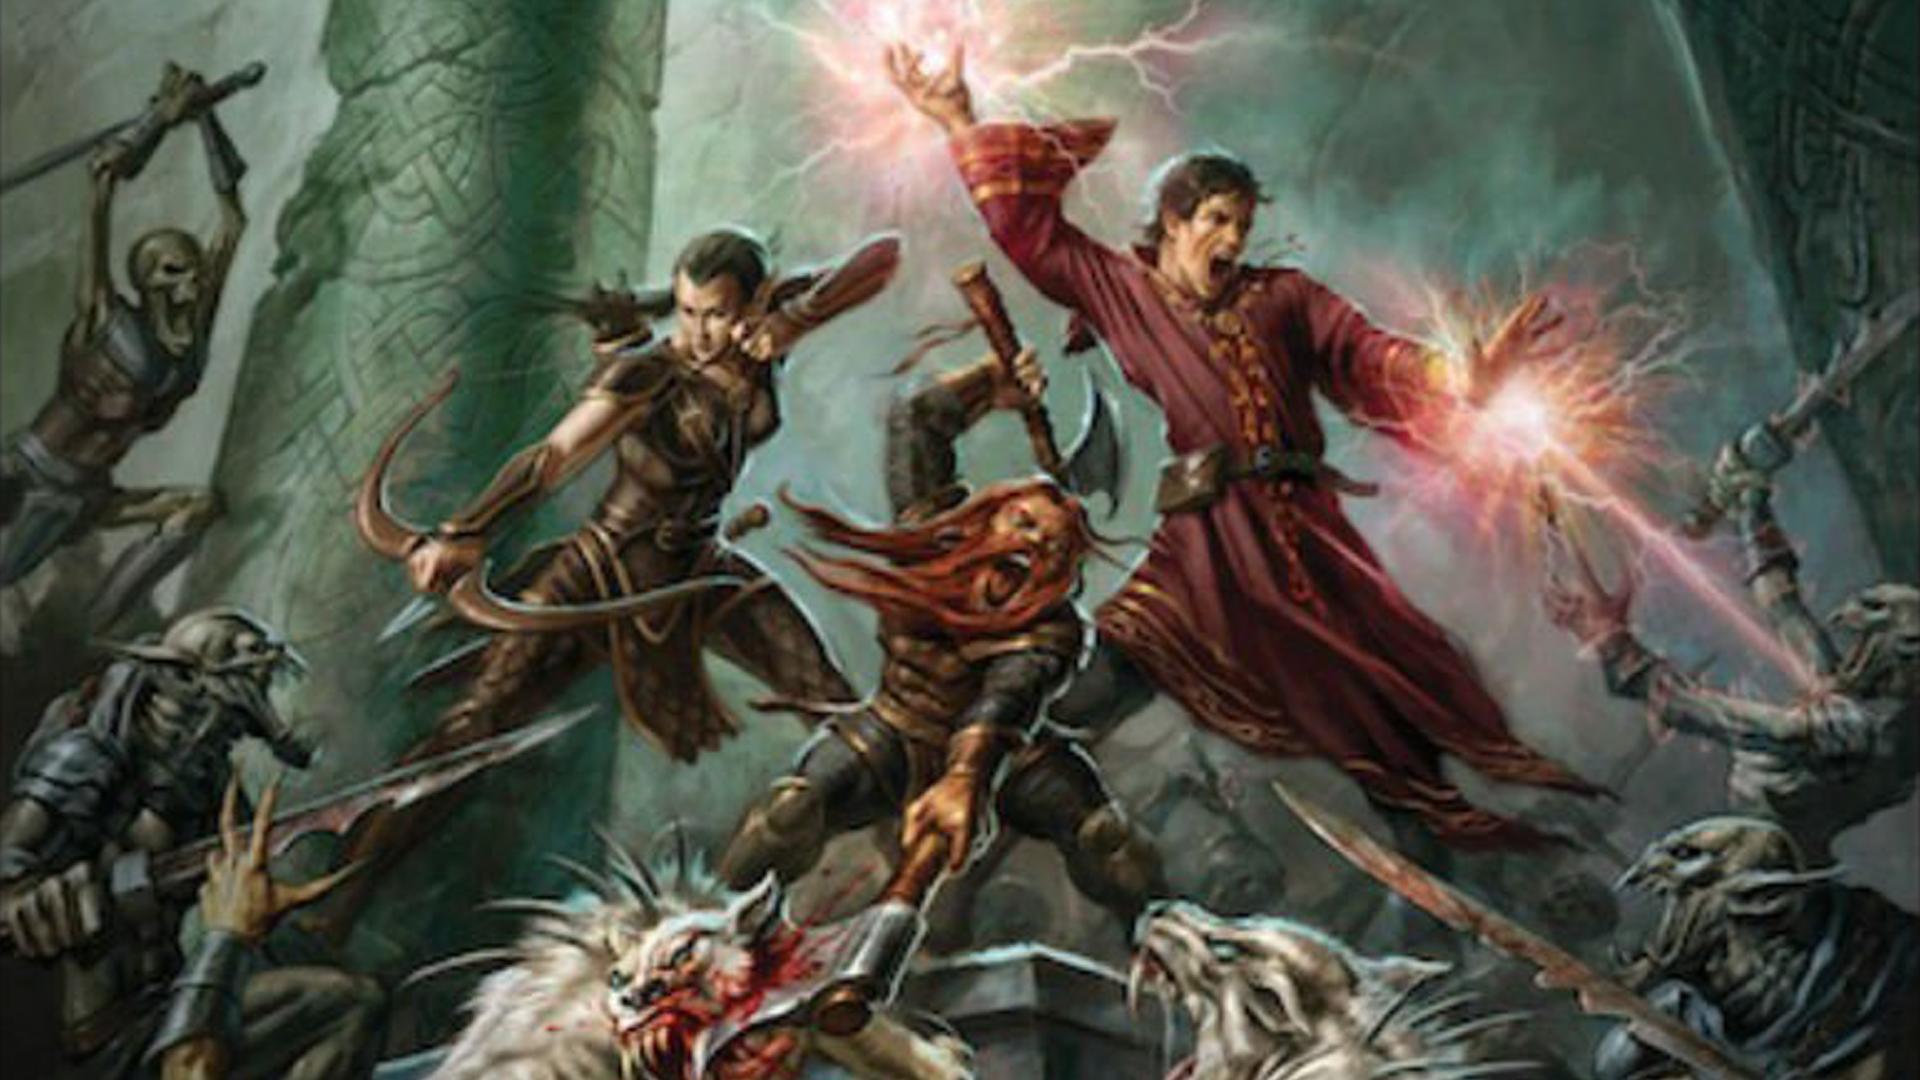 Dragon Age Roleplaying Game artwork 3